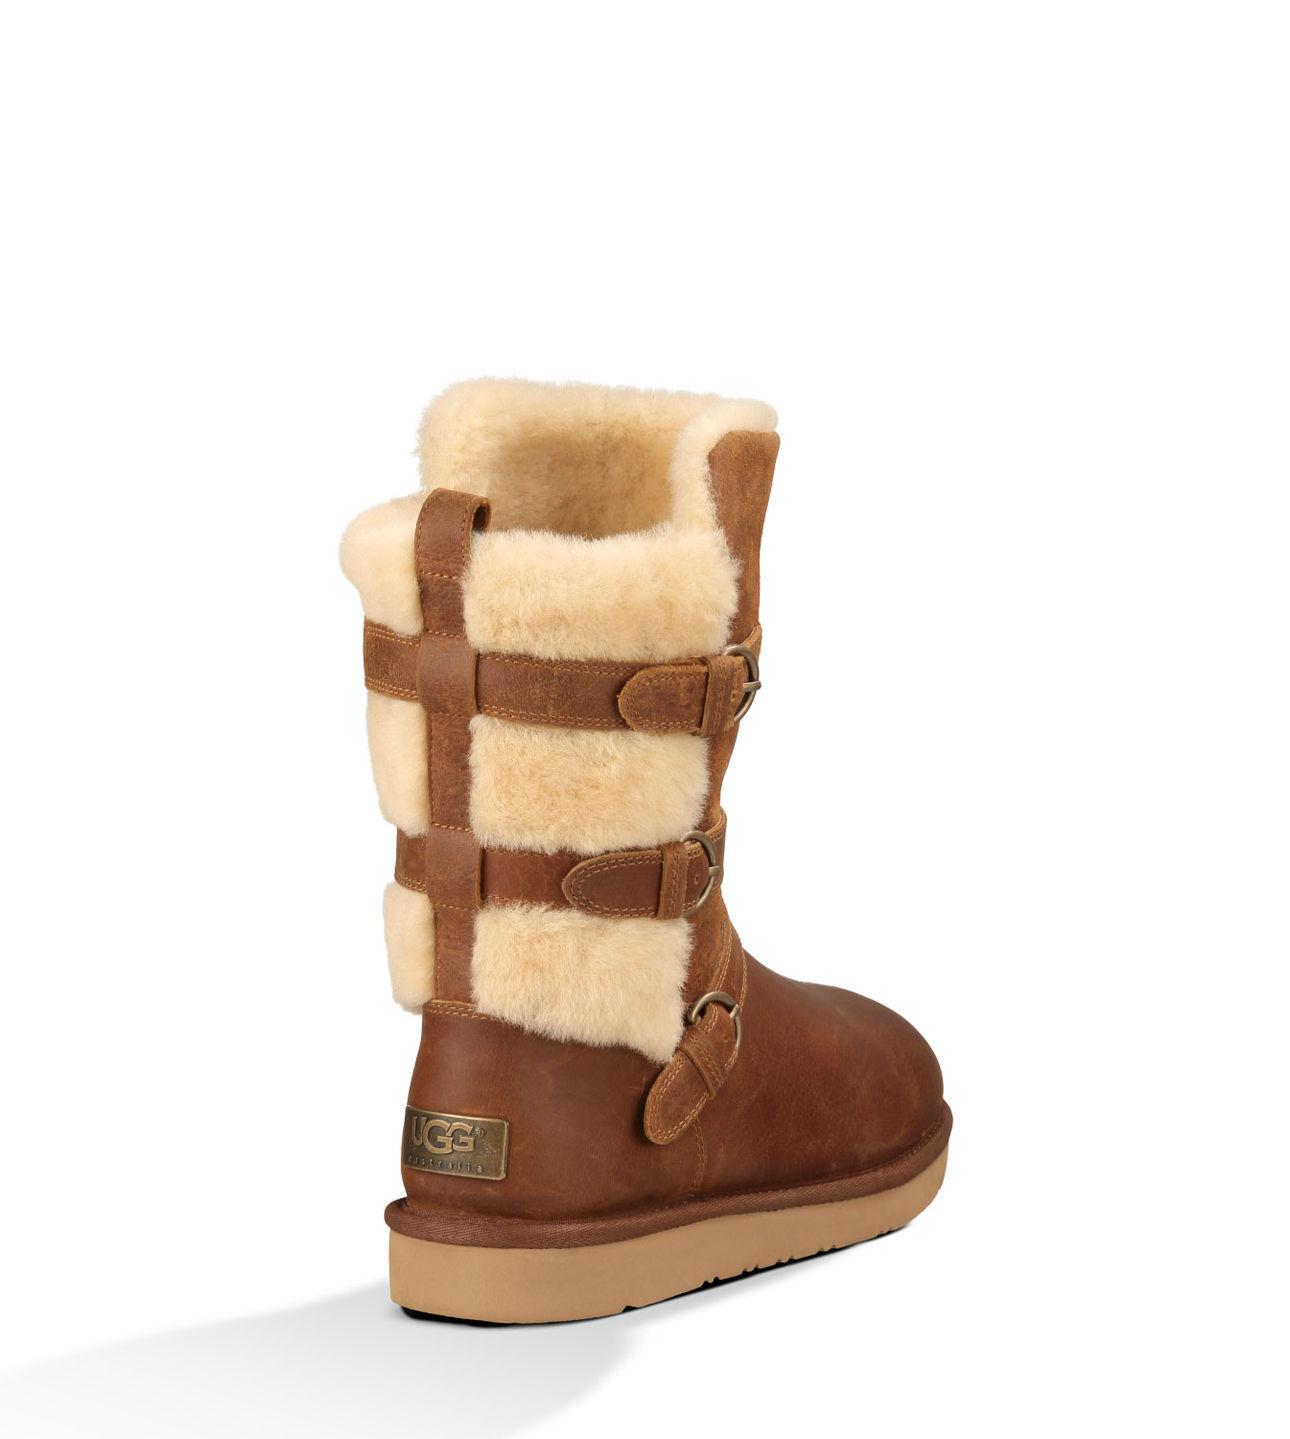 bc12ae13db3 Womens Ugg Australia Tan Becket Boots | Mindwise